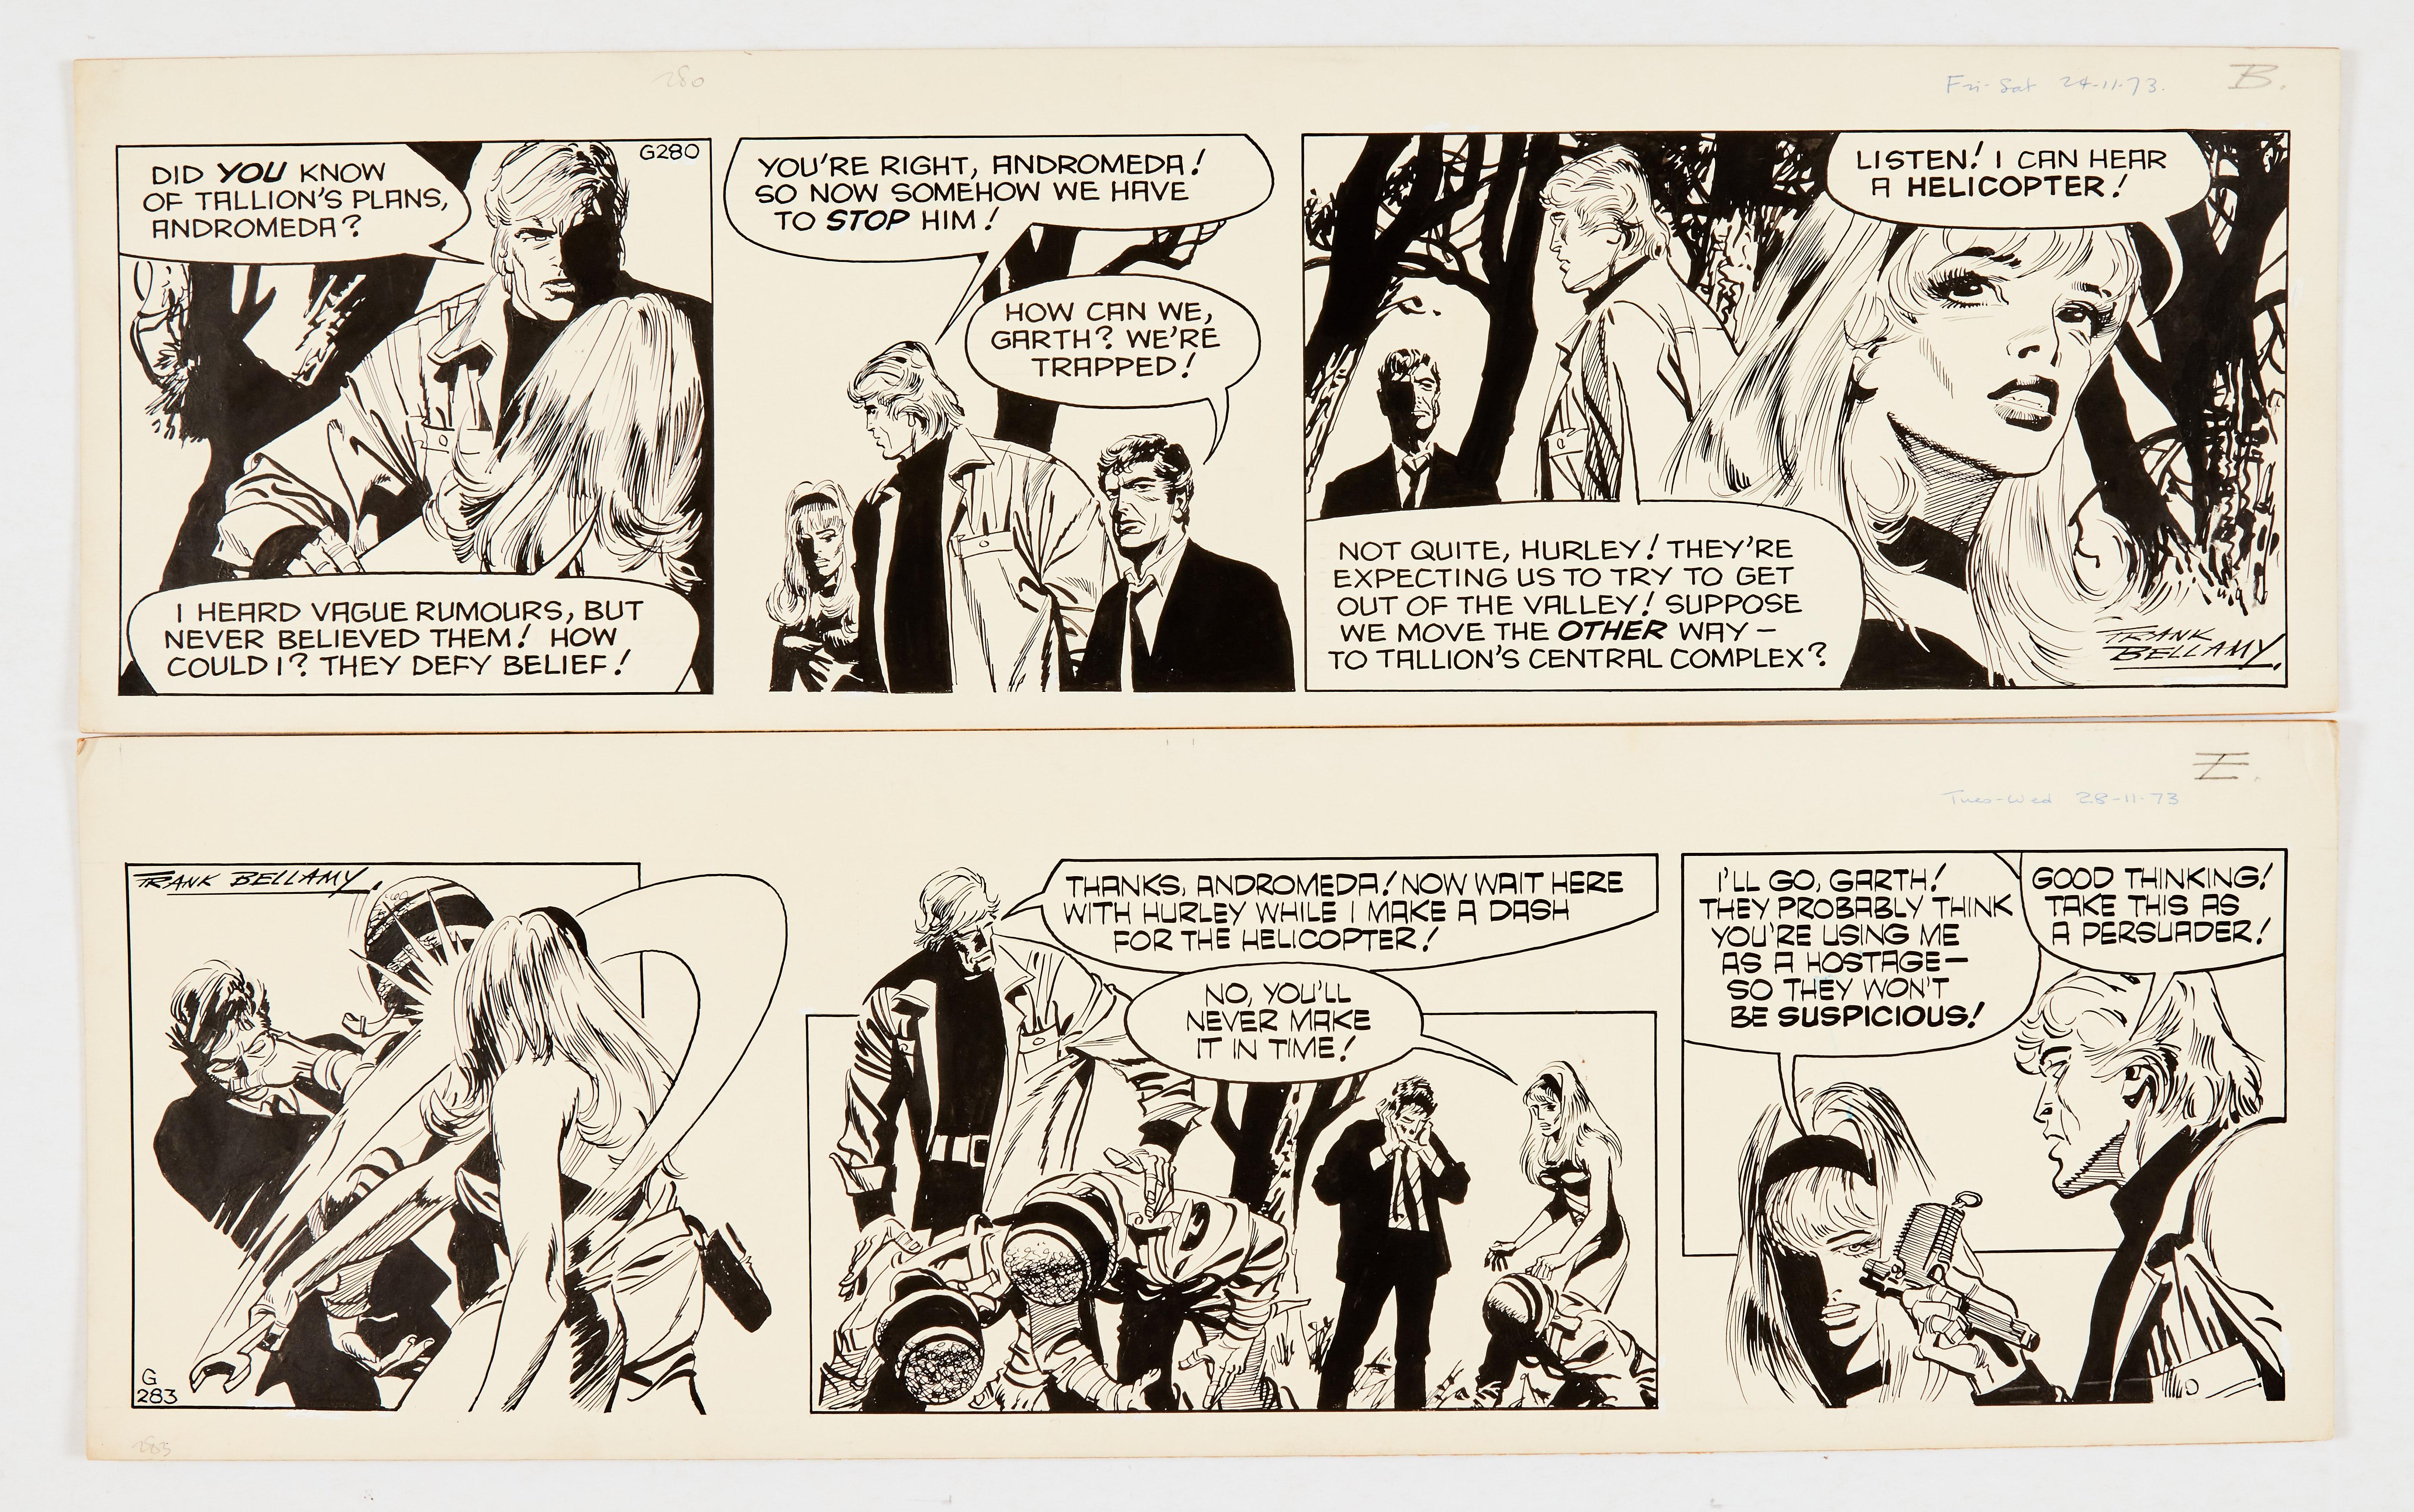 Garth: 'The Wreckers' two original artworks (1973) by Frank Bellamy (both signed) 24/28 Nov 1973.